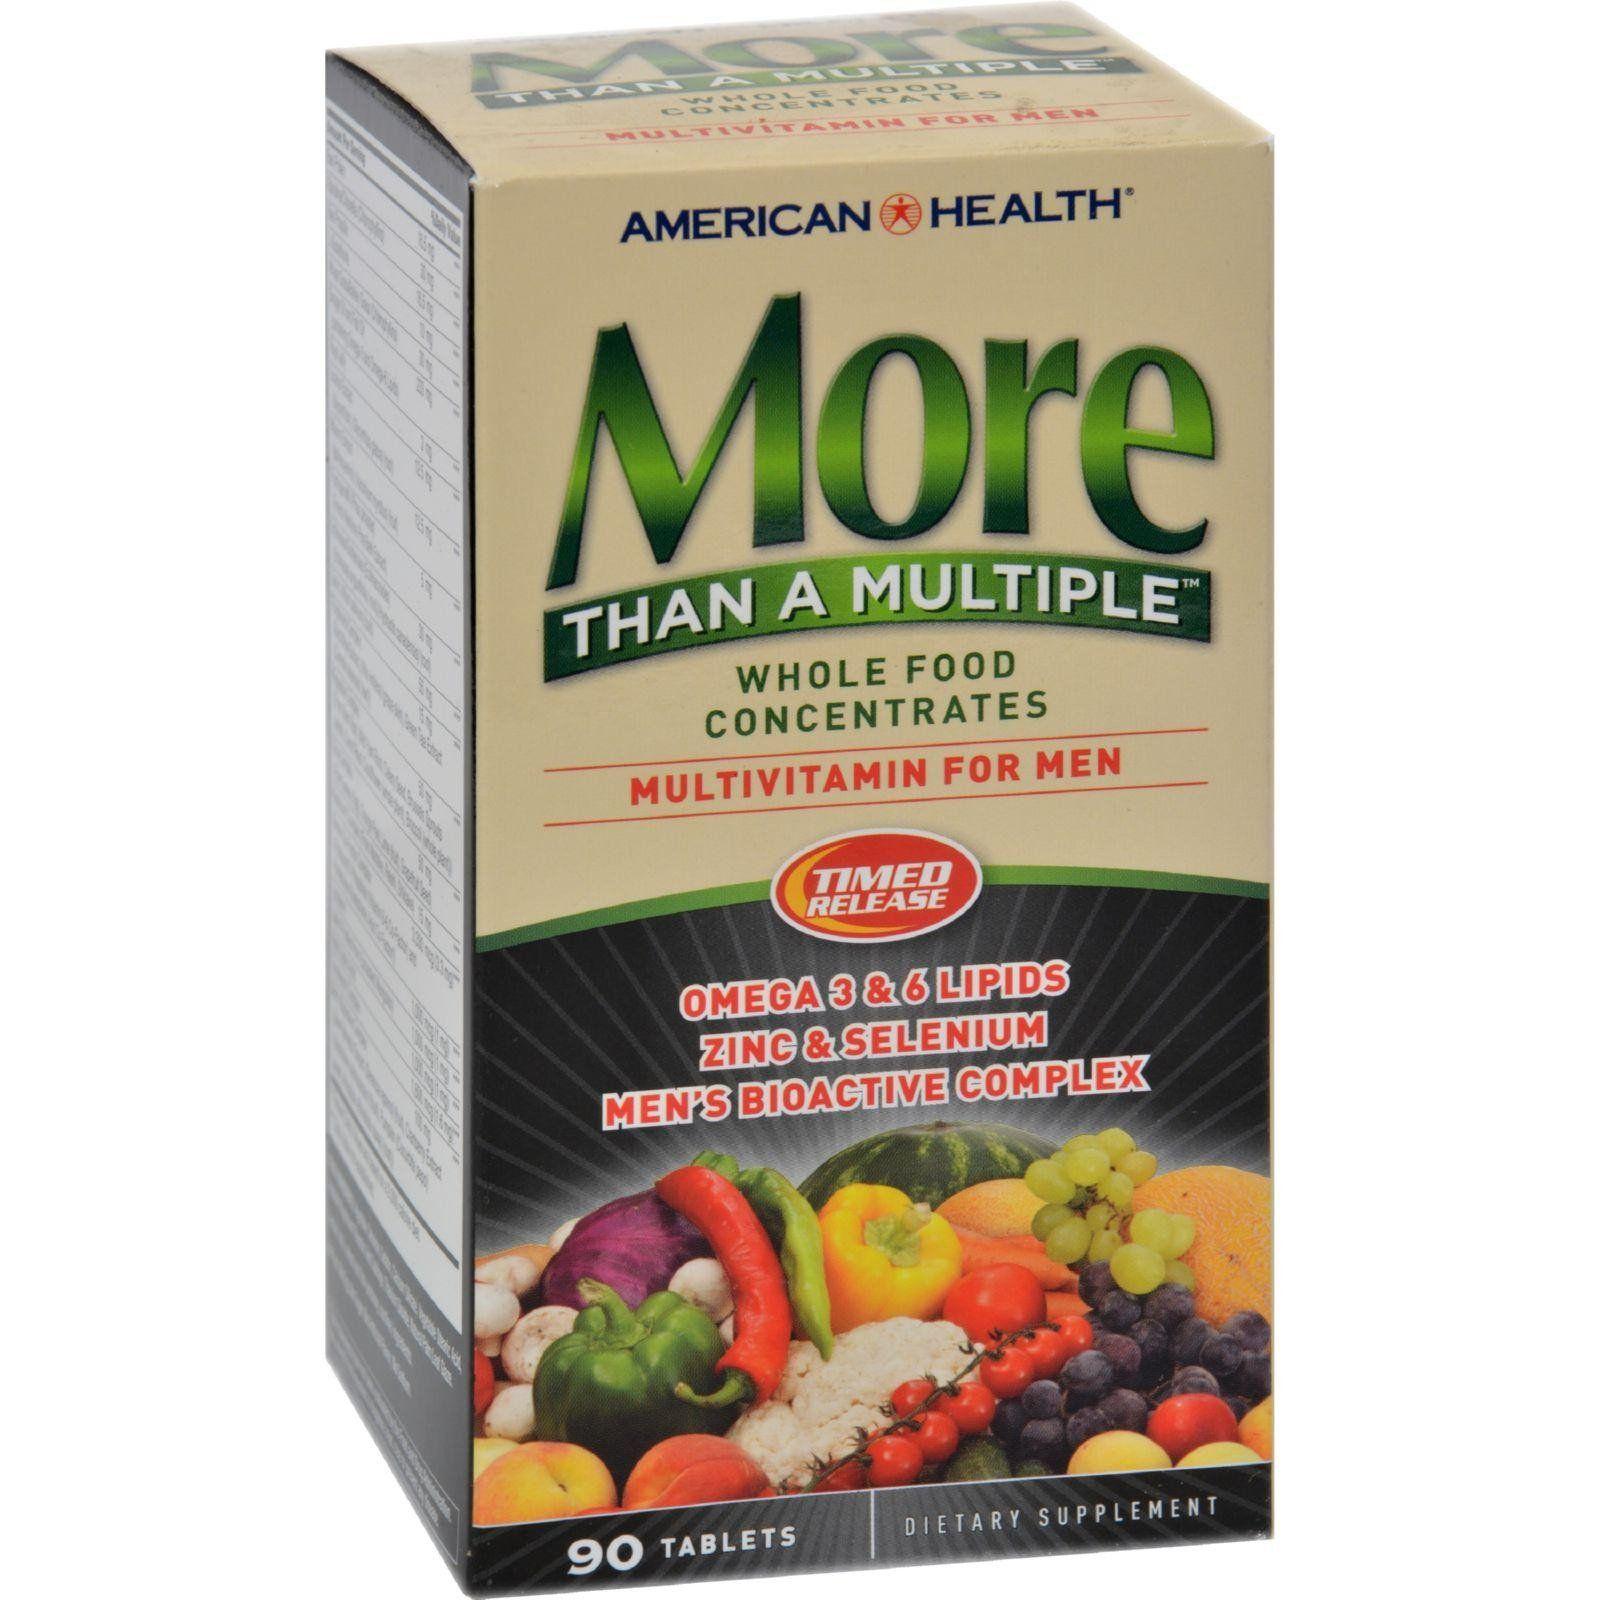 whole food multivitamin for men